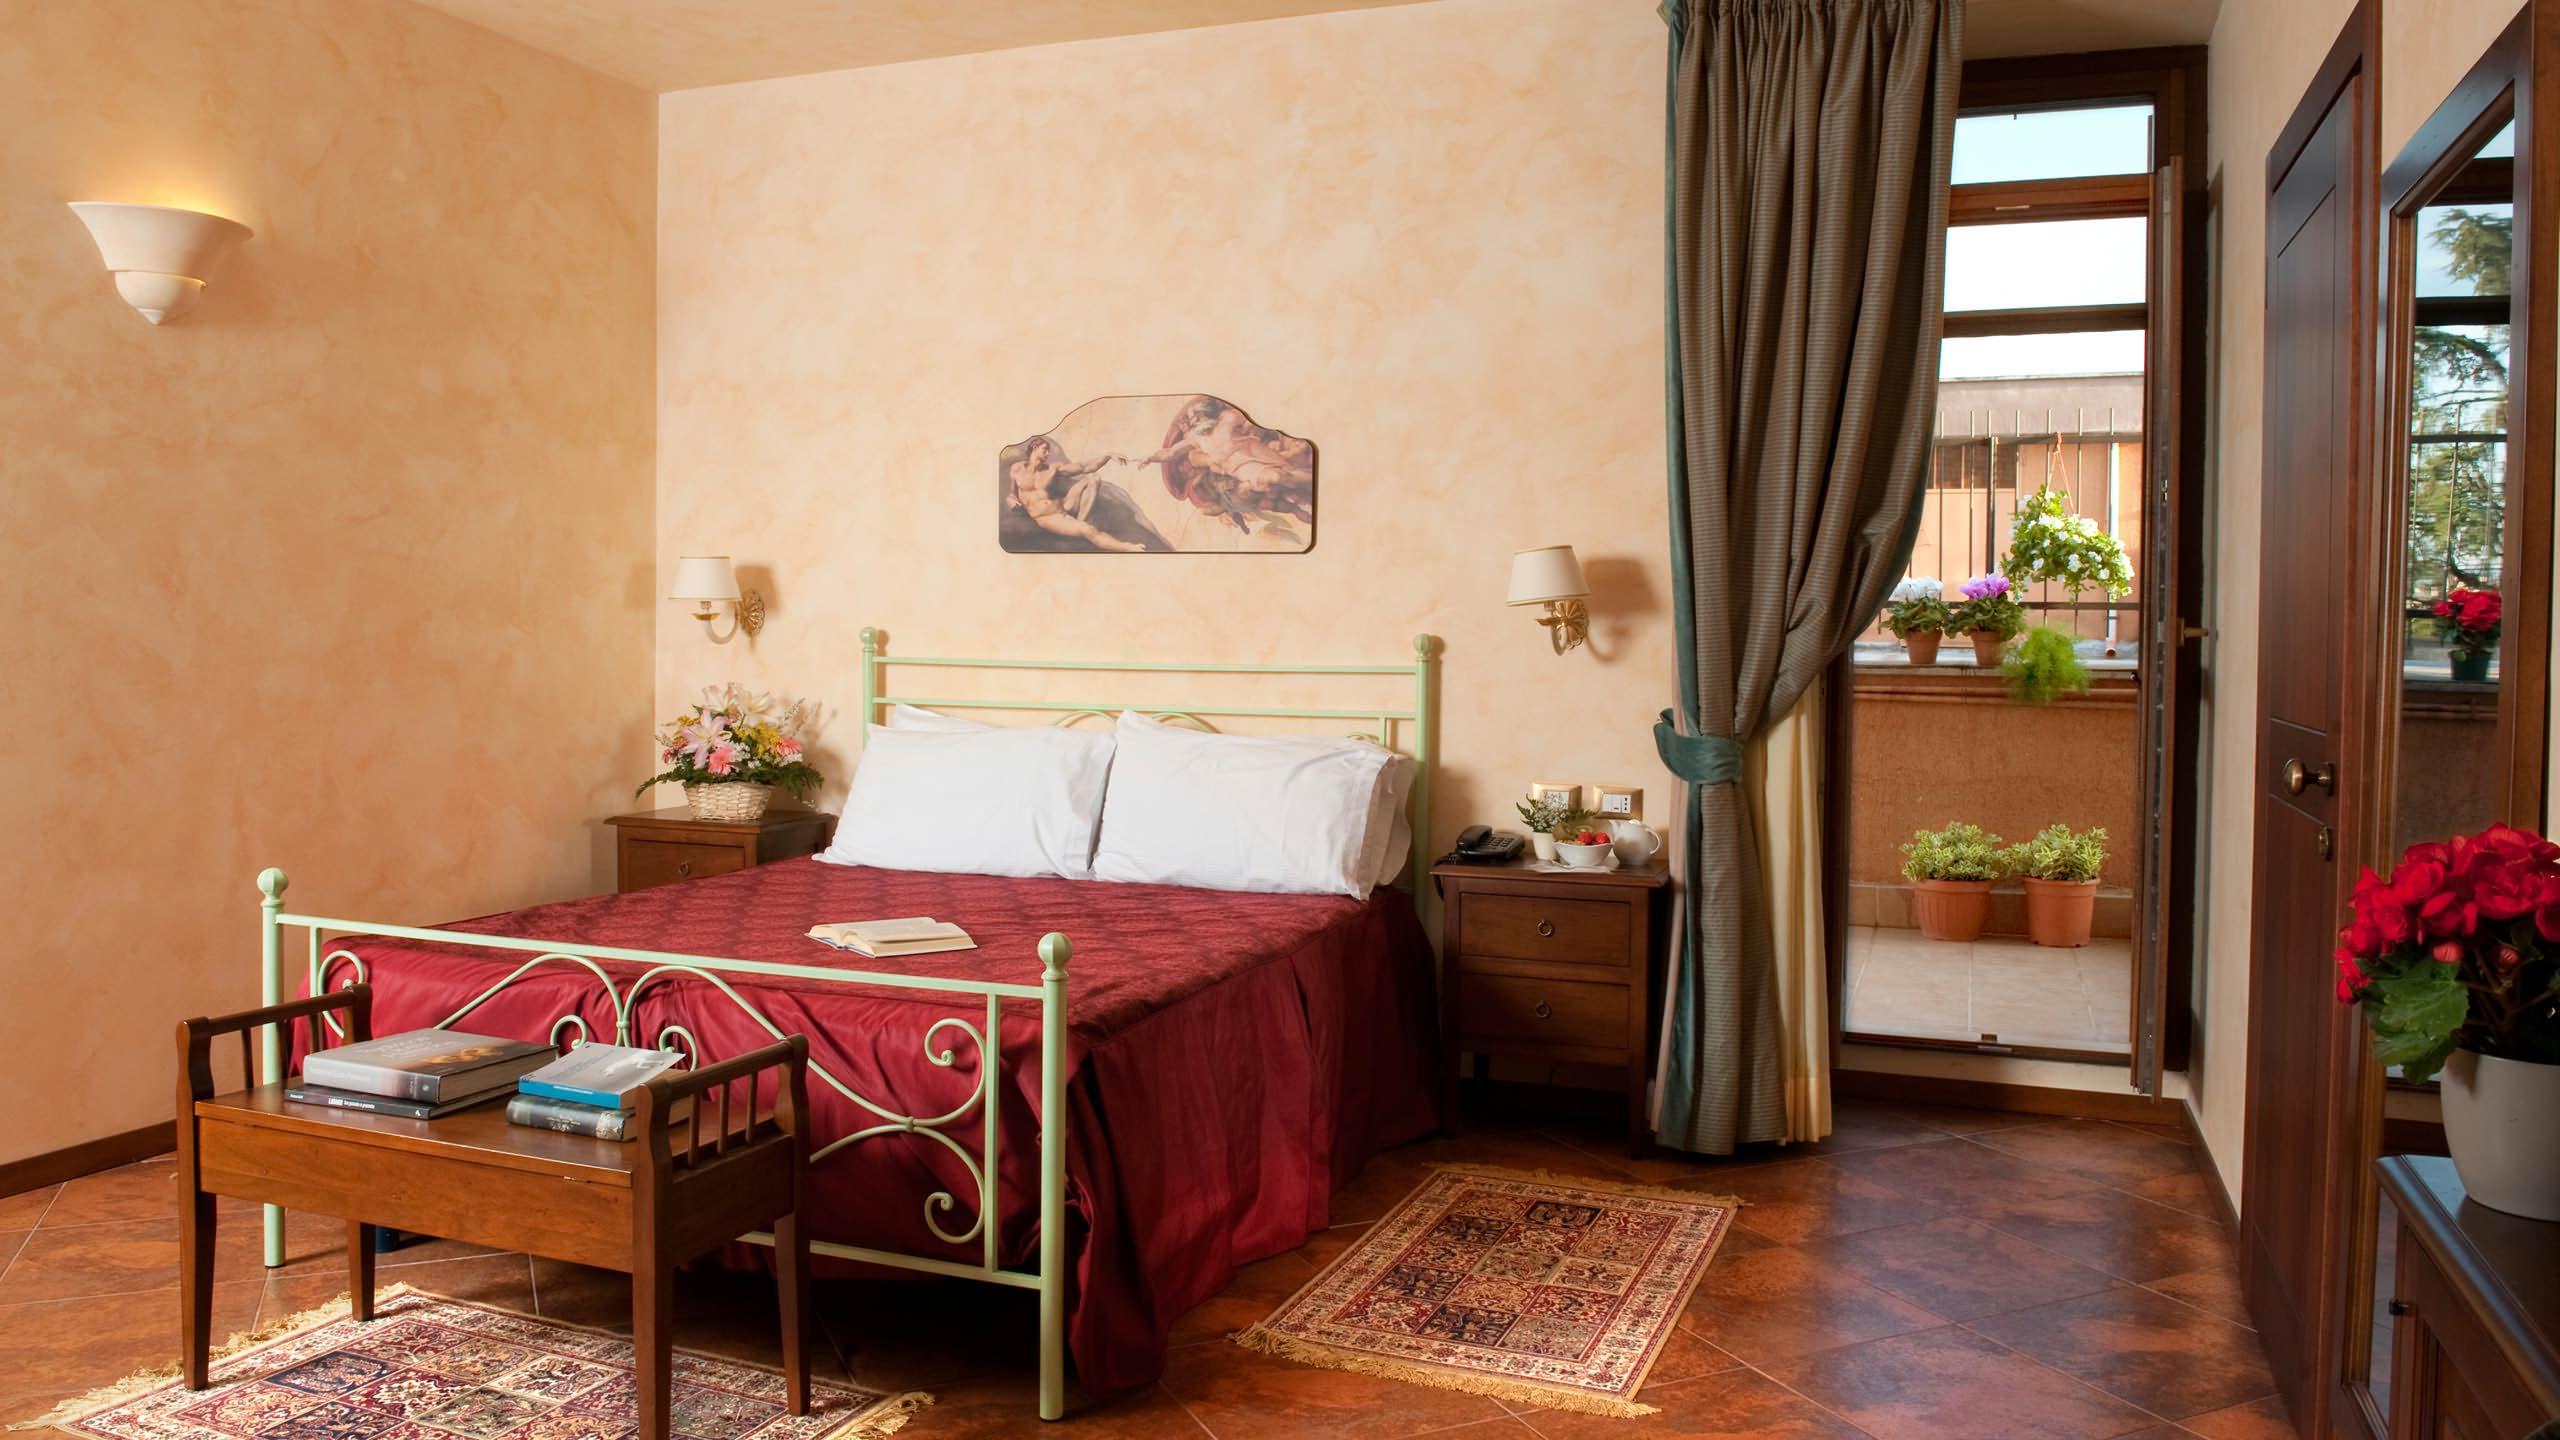 oc-casali-rome-rooms-16